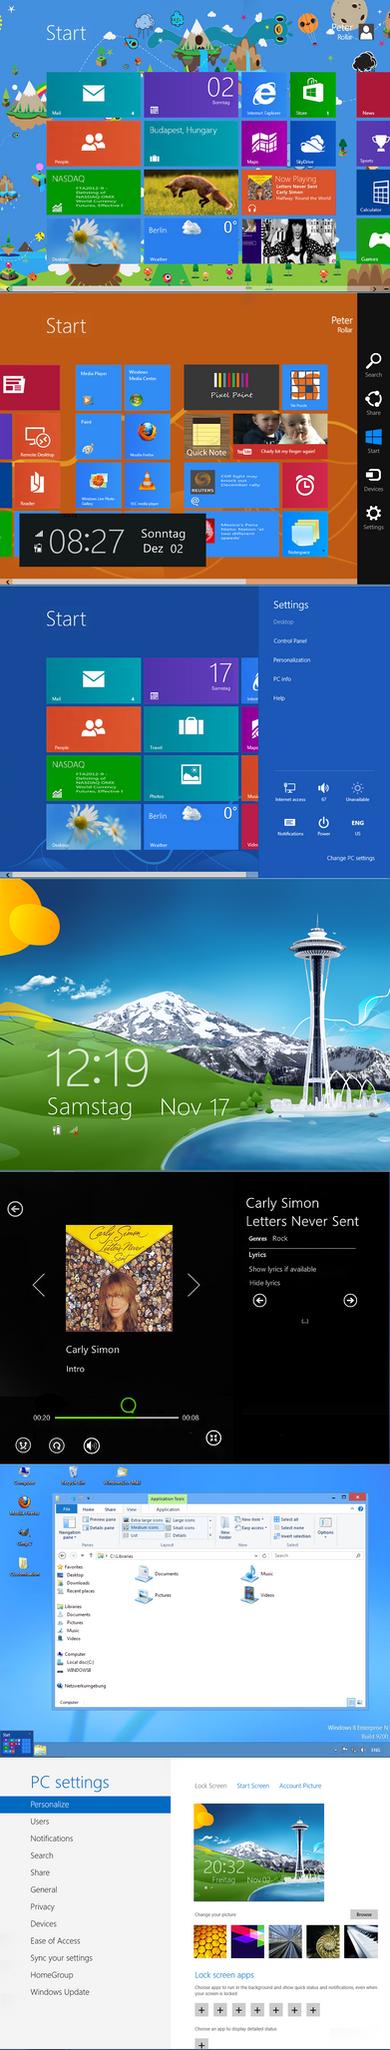 Windows 8 RTM Startscreen SDK by PeterRollar